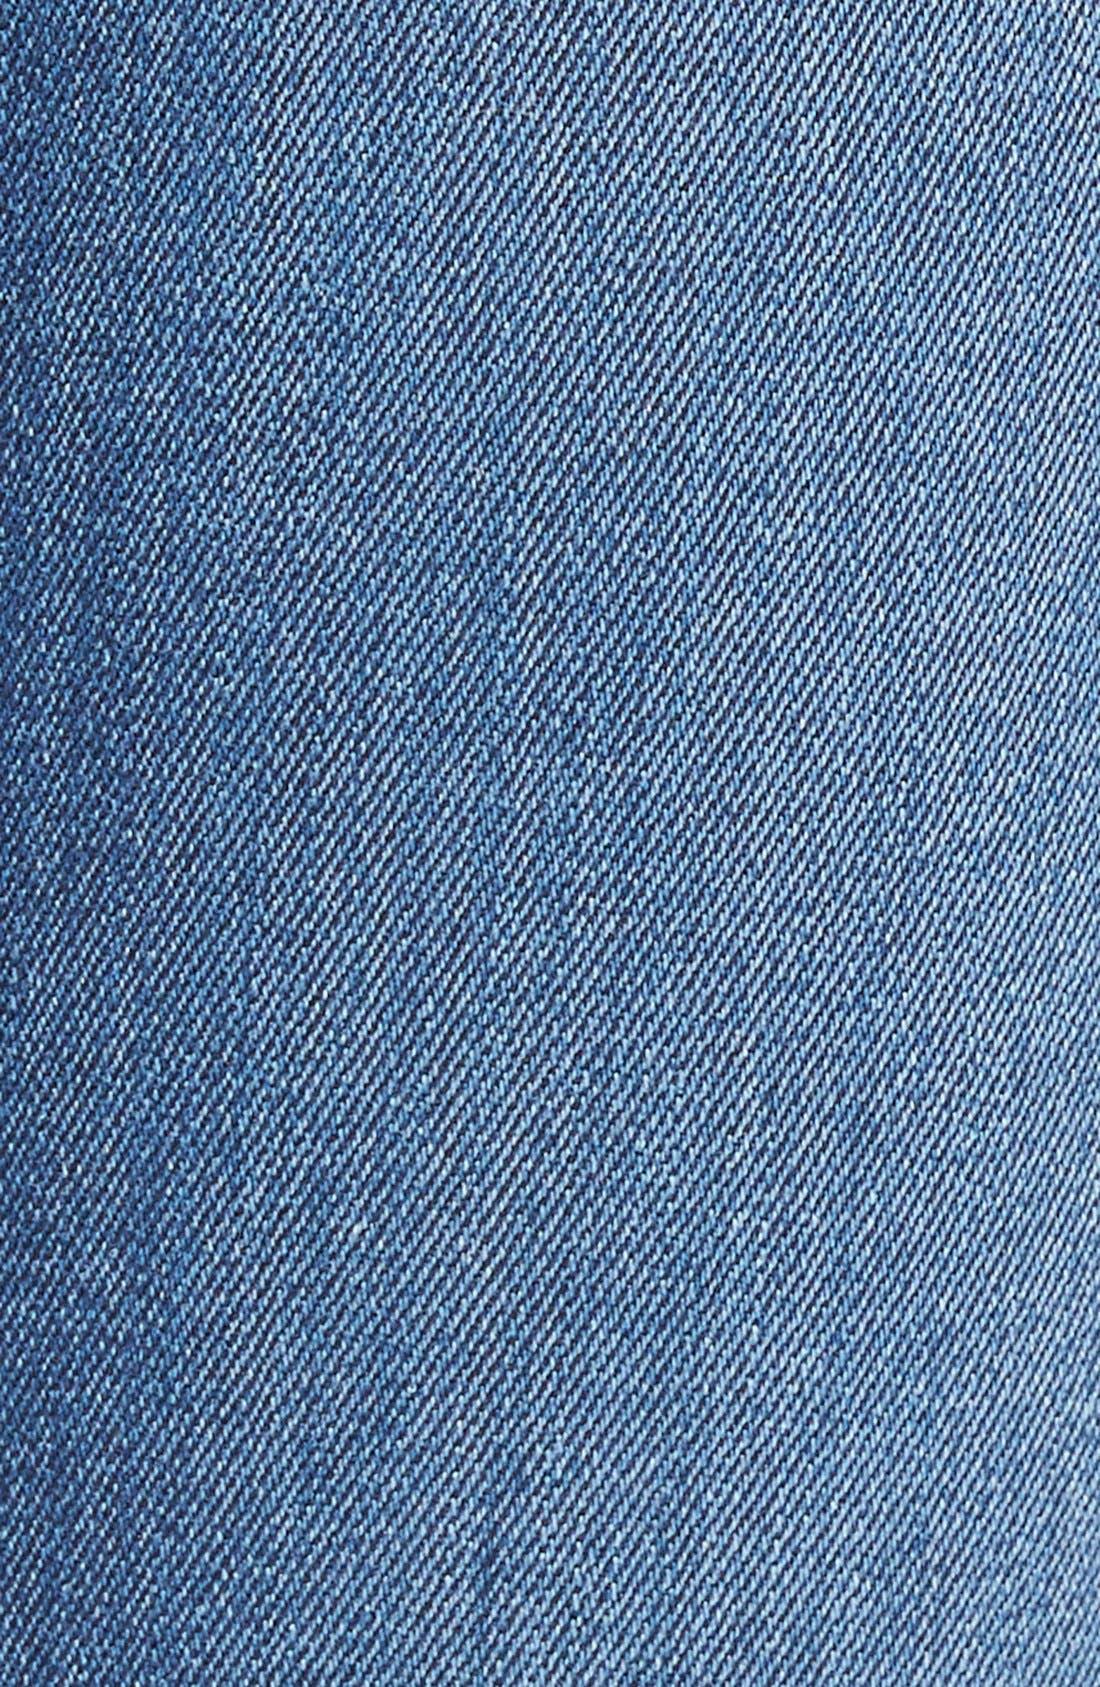 Alternate Image 5  - rag & bone/JEAN High Rise Skinny Jeans (Houston)